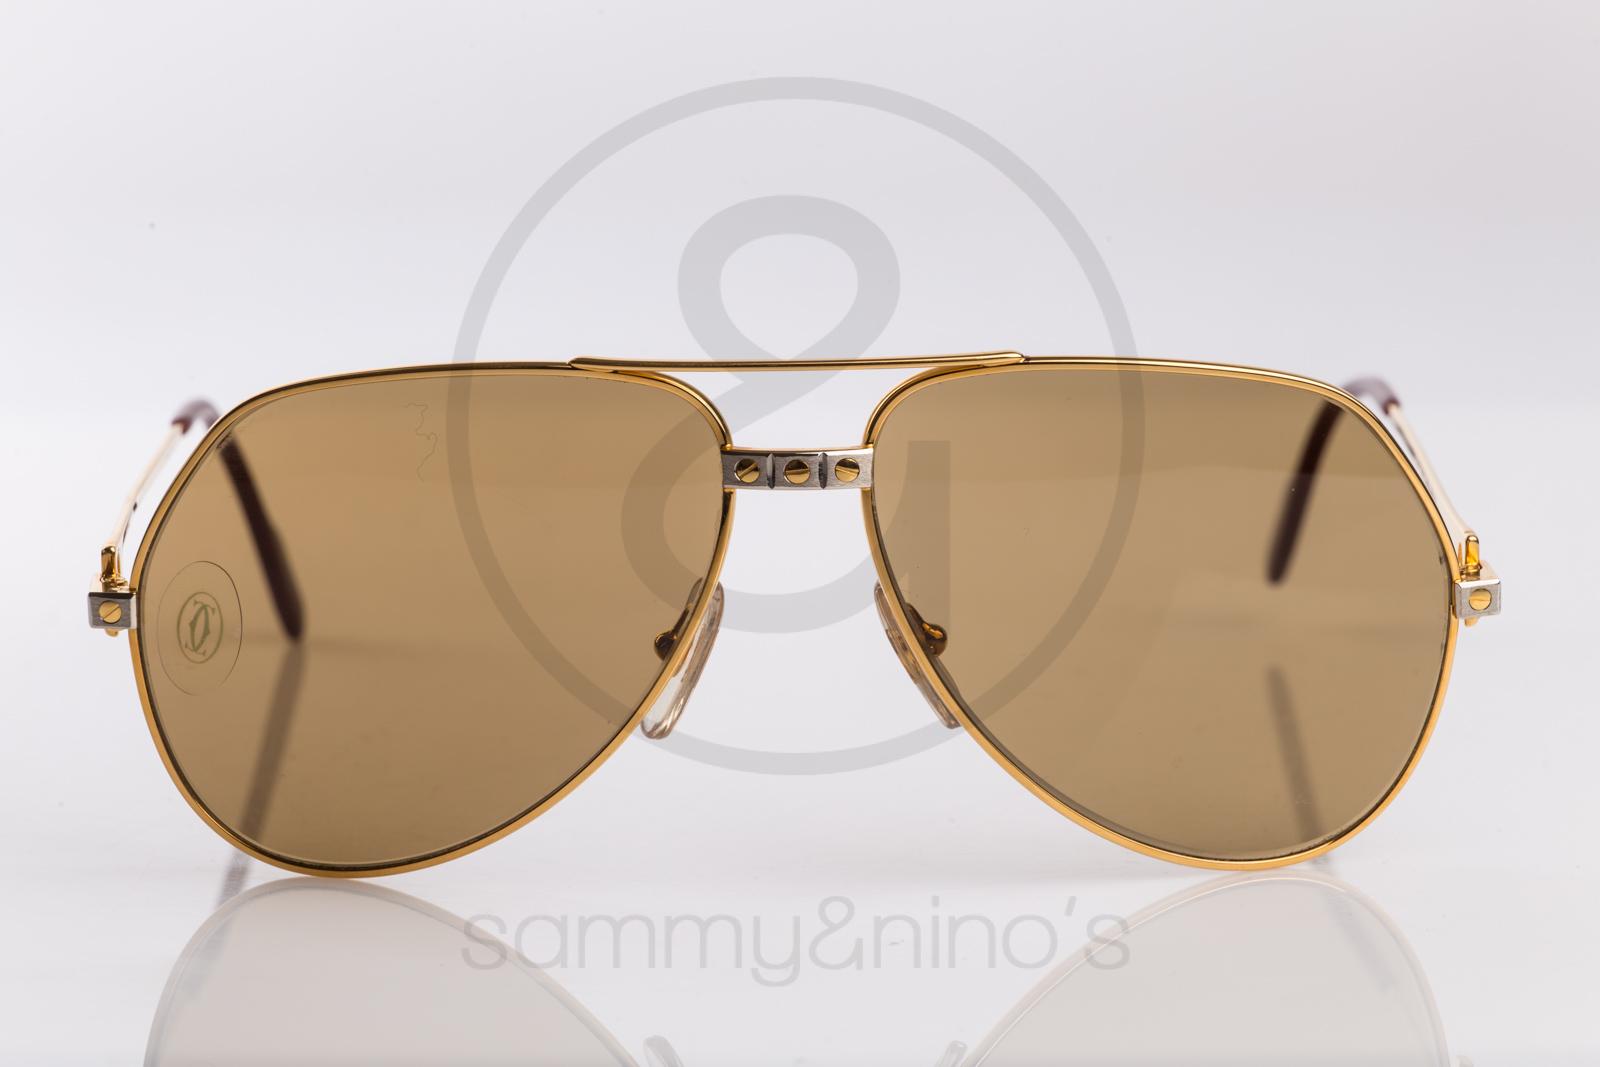 35cc5a01a65 Cartier Santos Sunglasses « Heritage Malta